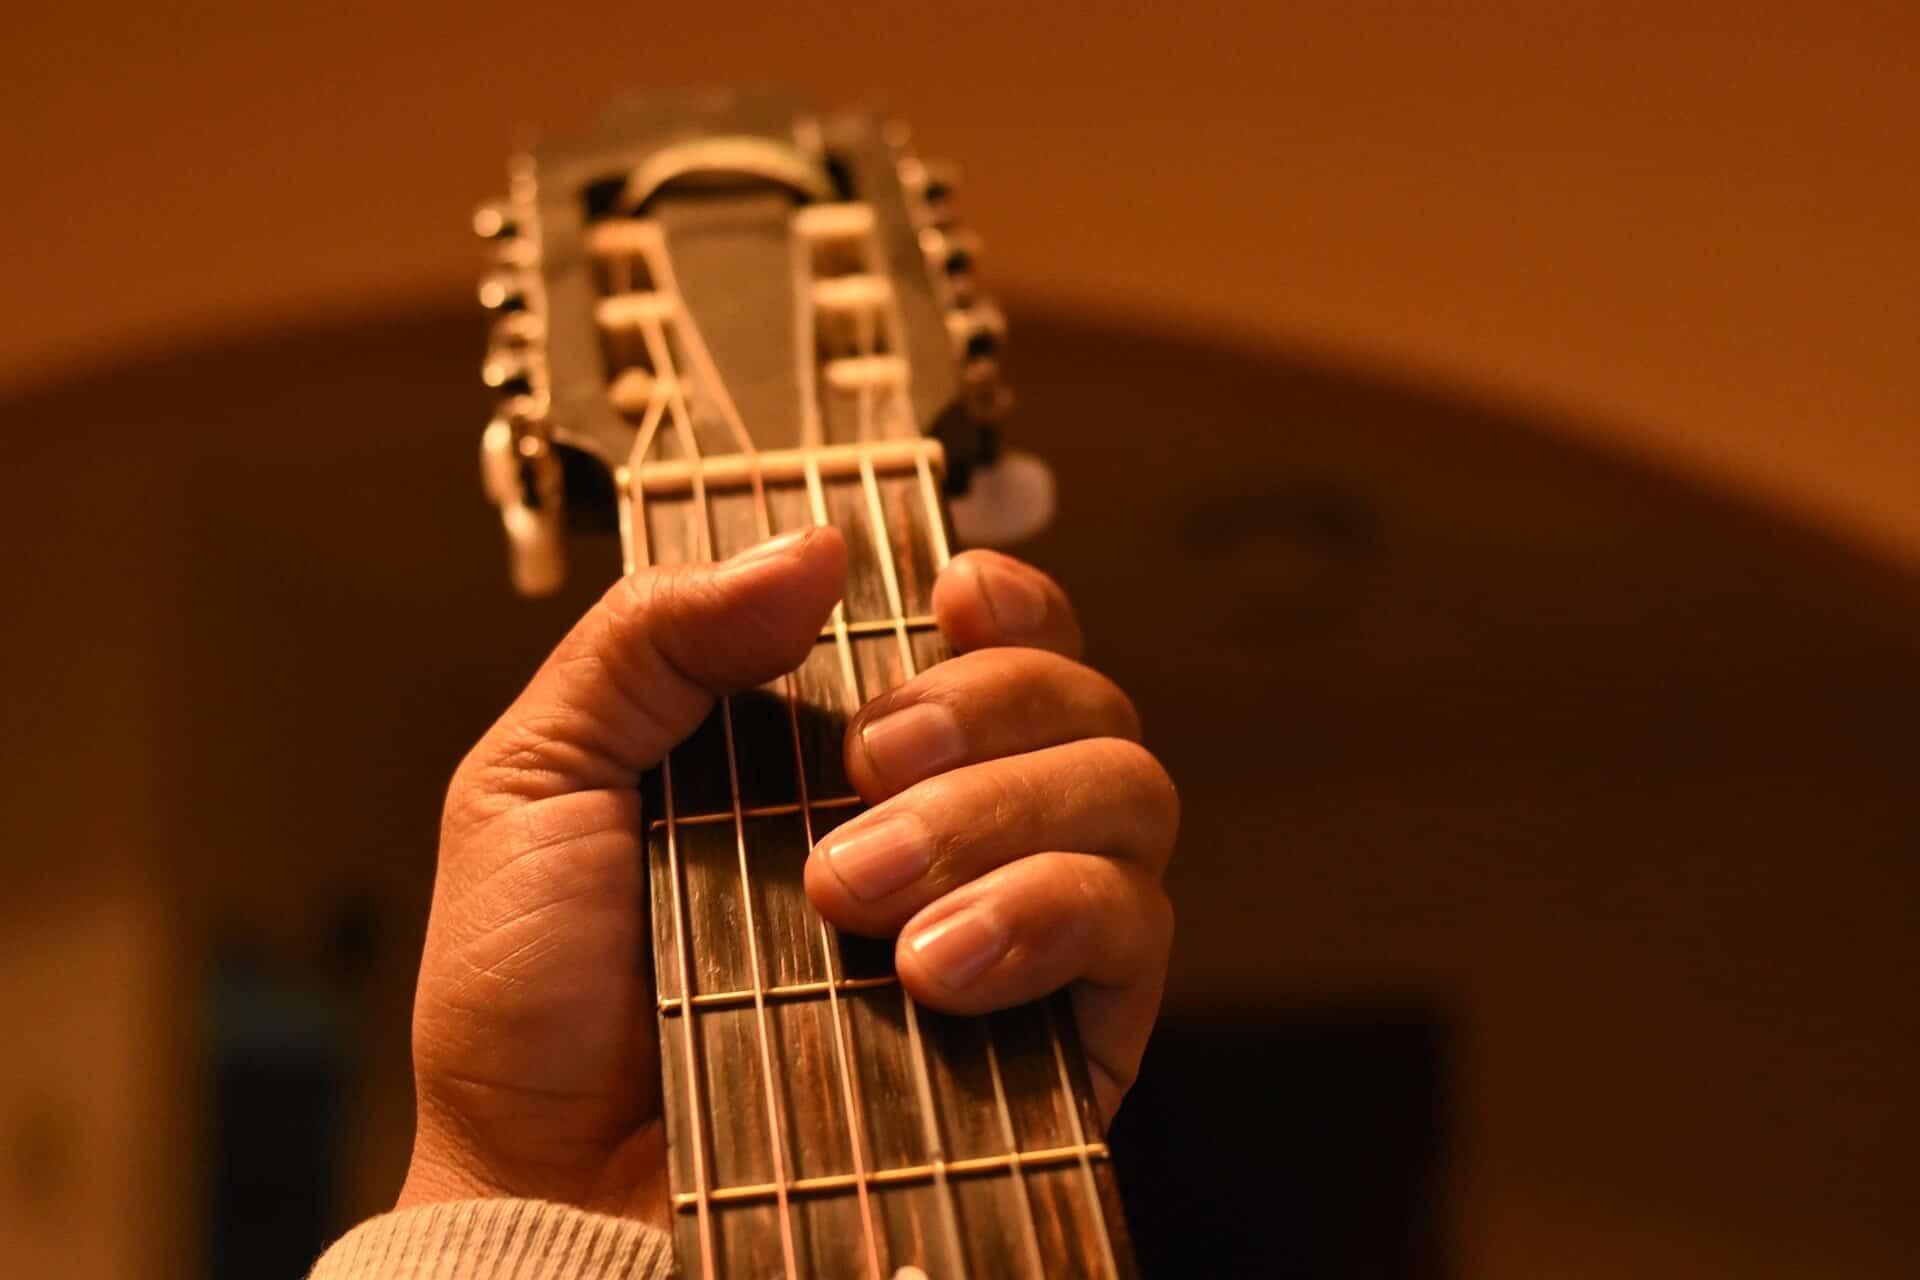 גיטרה קלאסית עם צוואר נוח